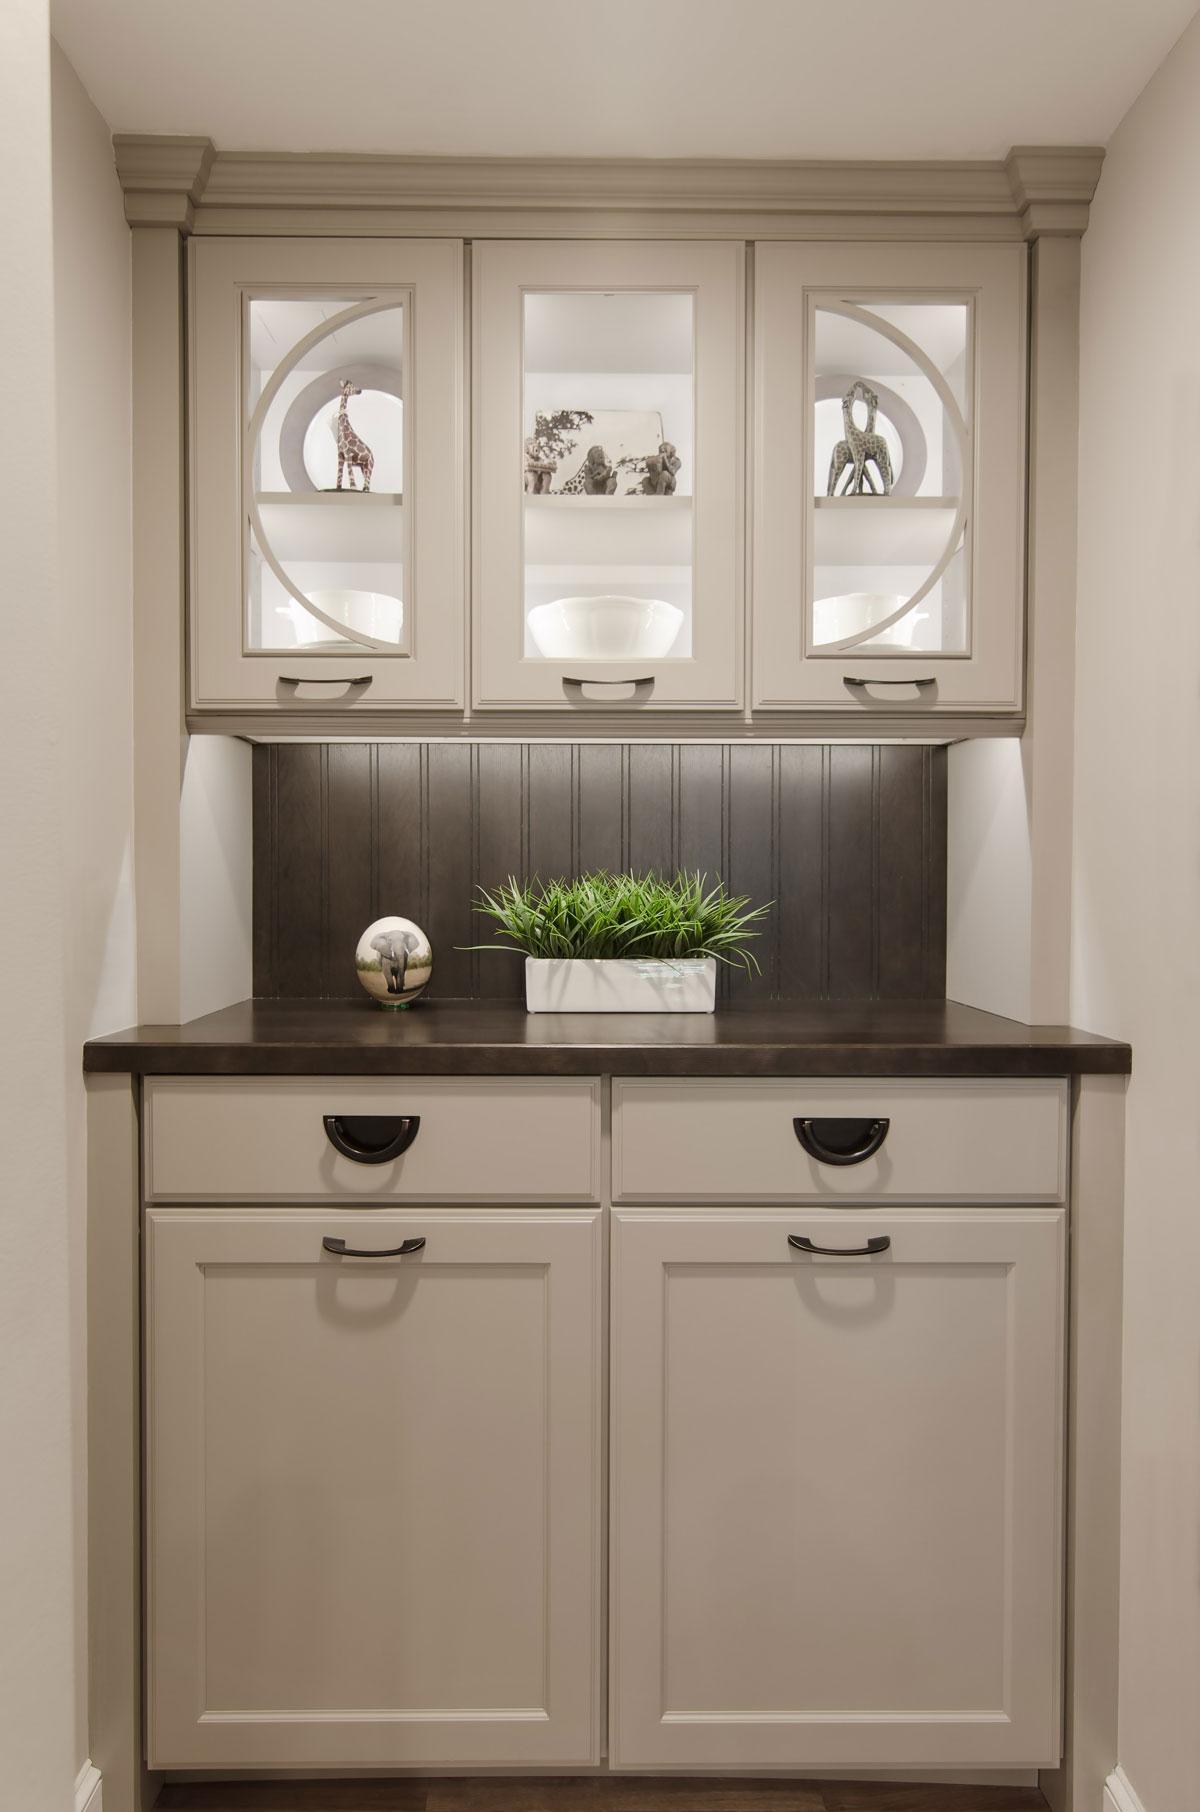 Braintree, MA laundry room interior design